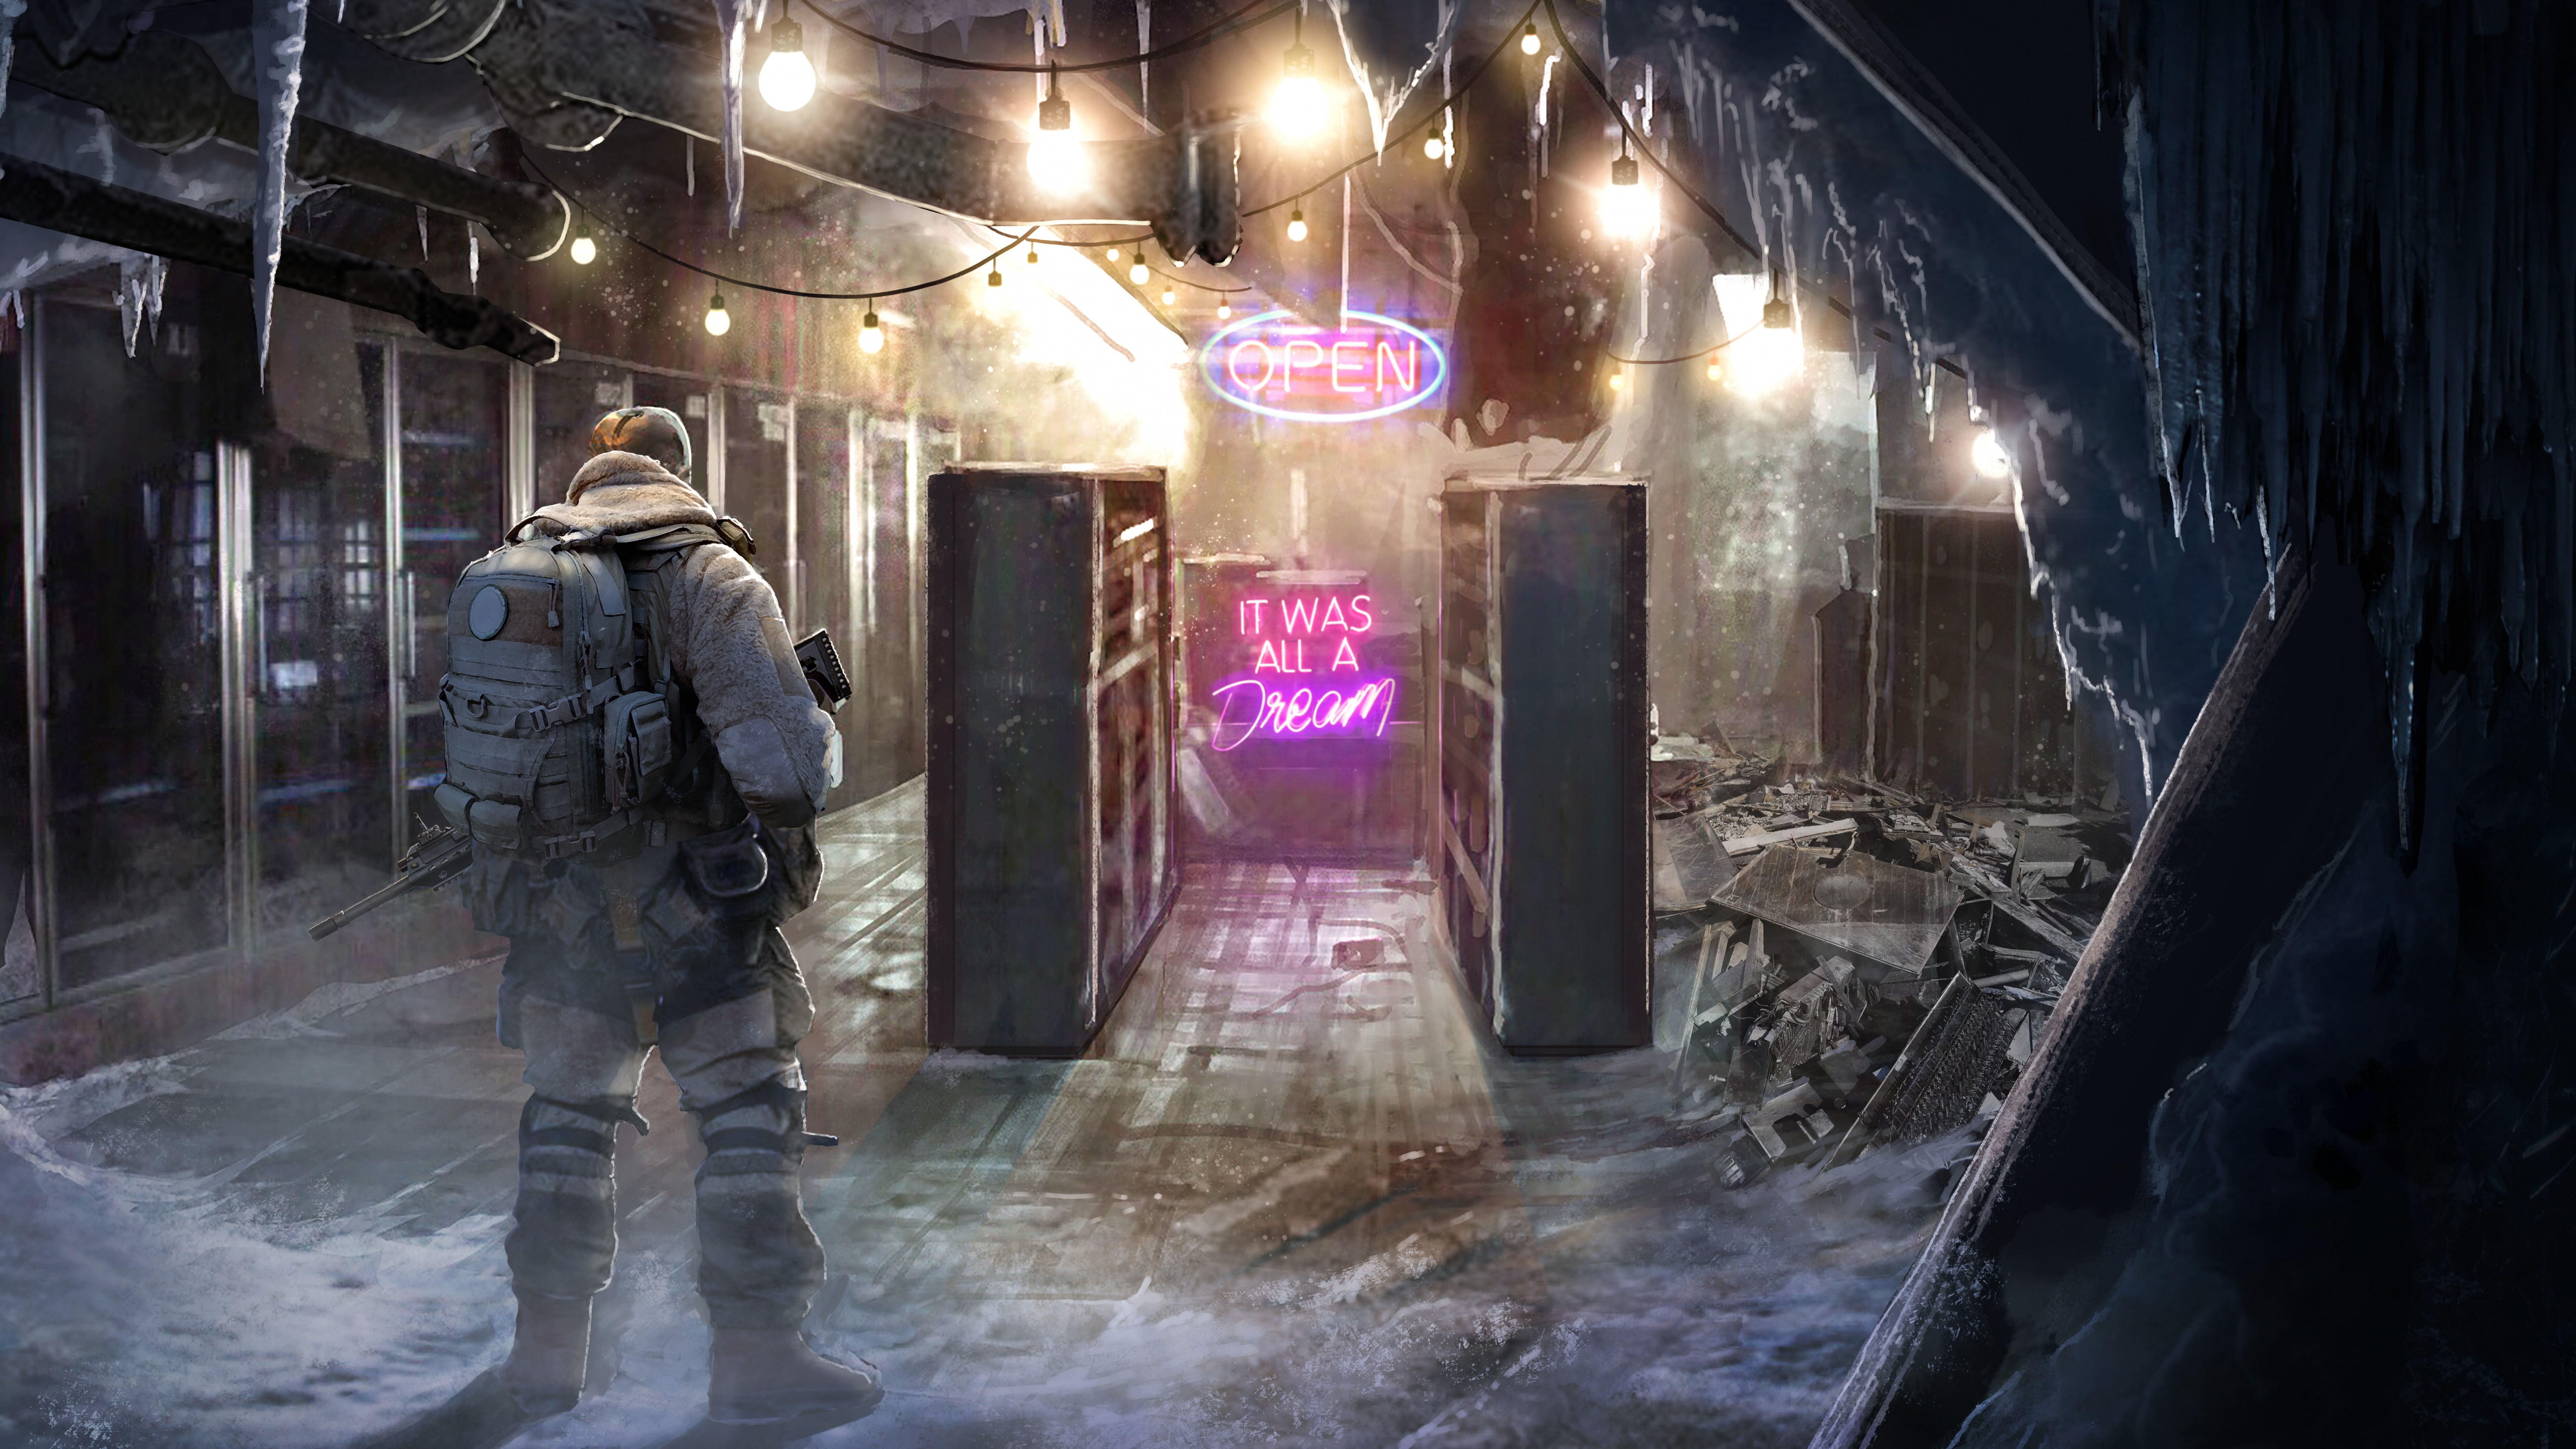 Fondos de pantalla Wasteland 3 2020